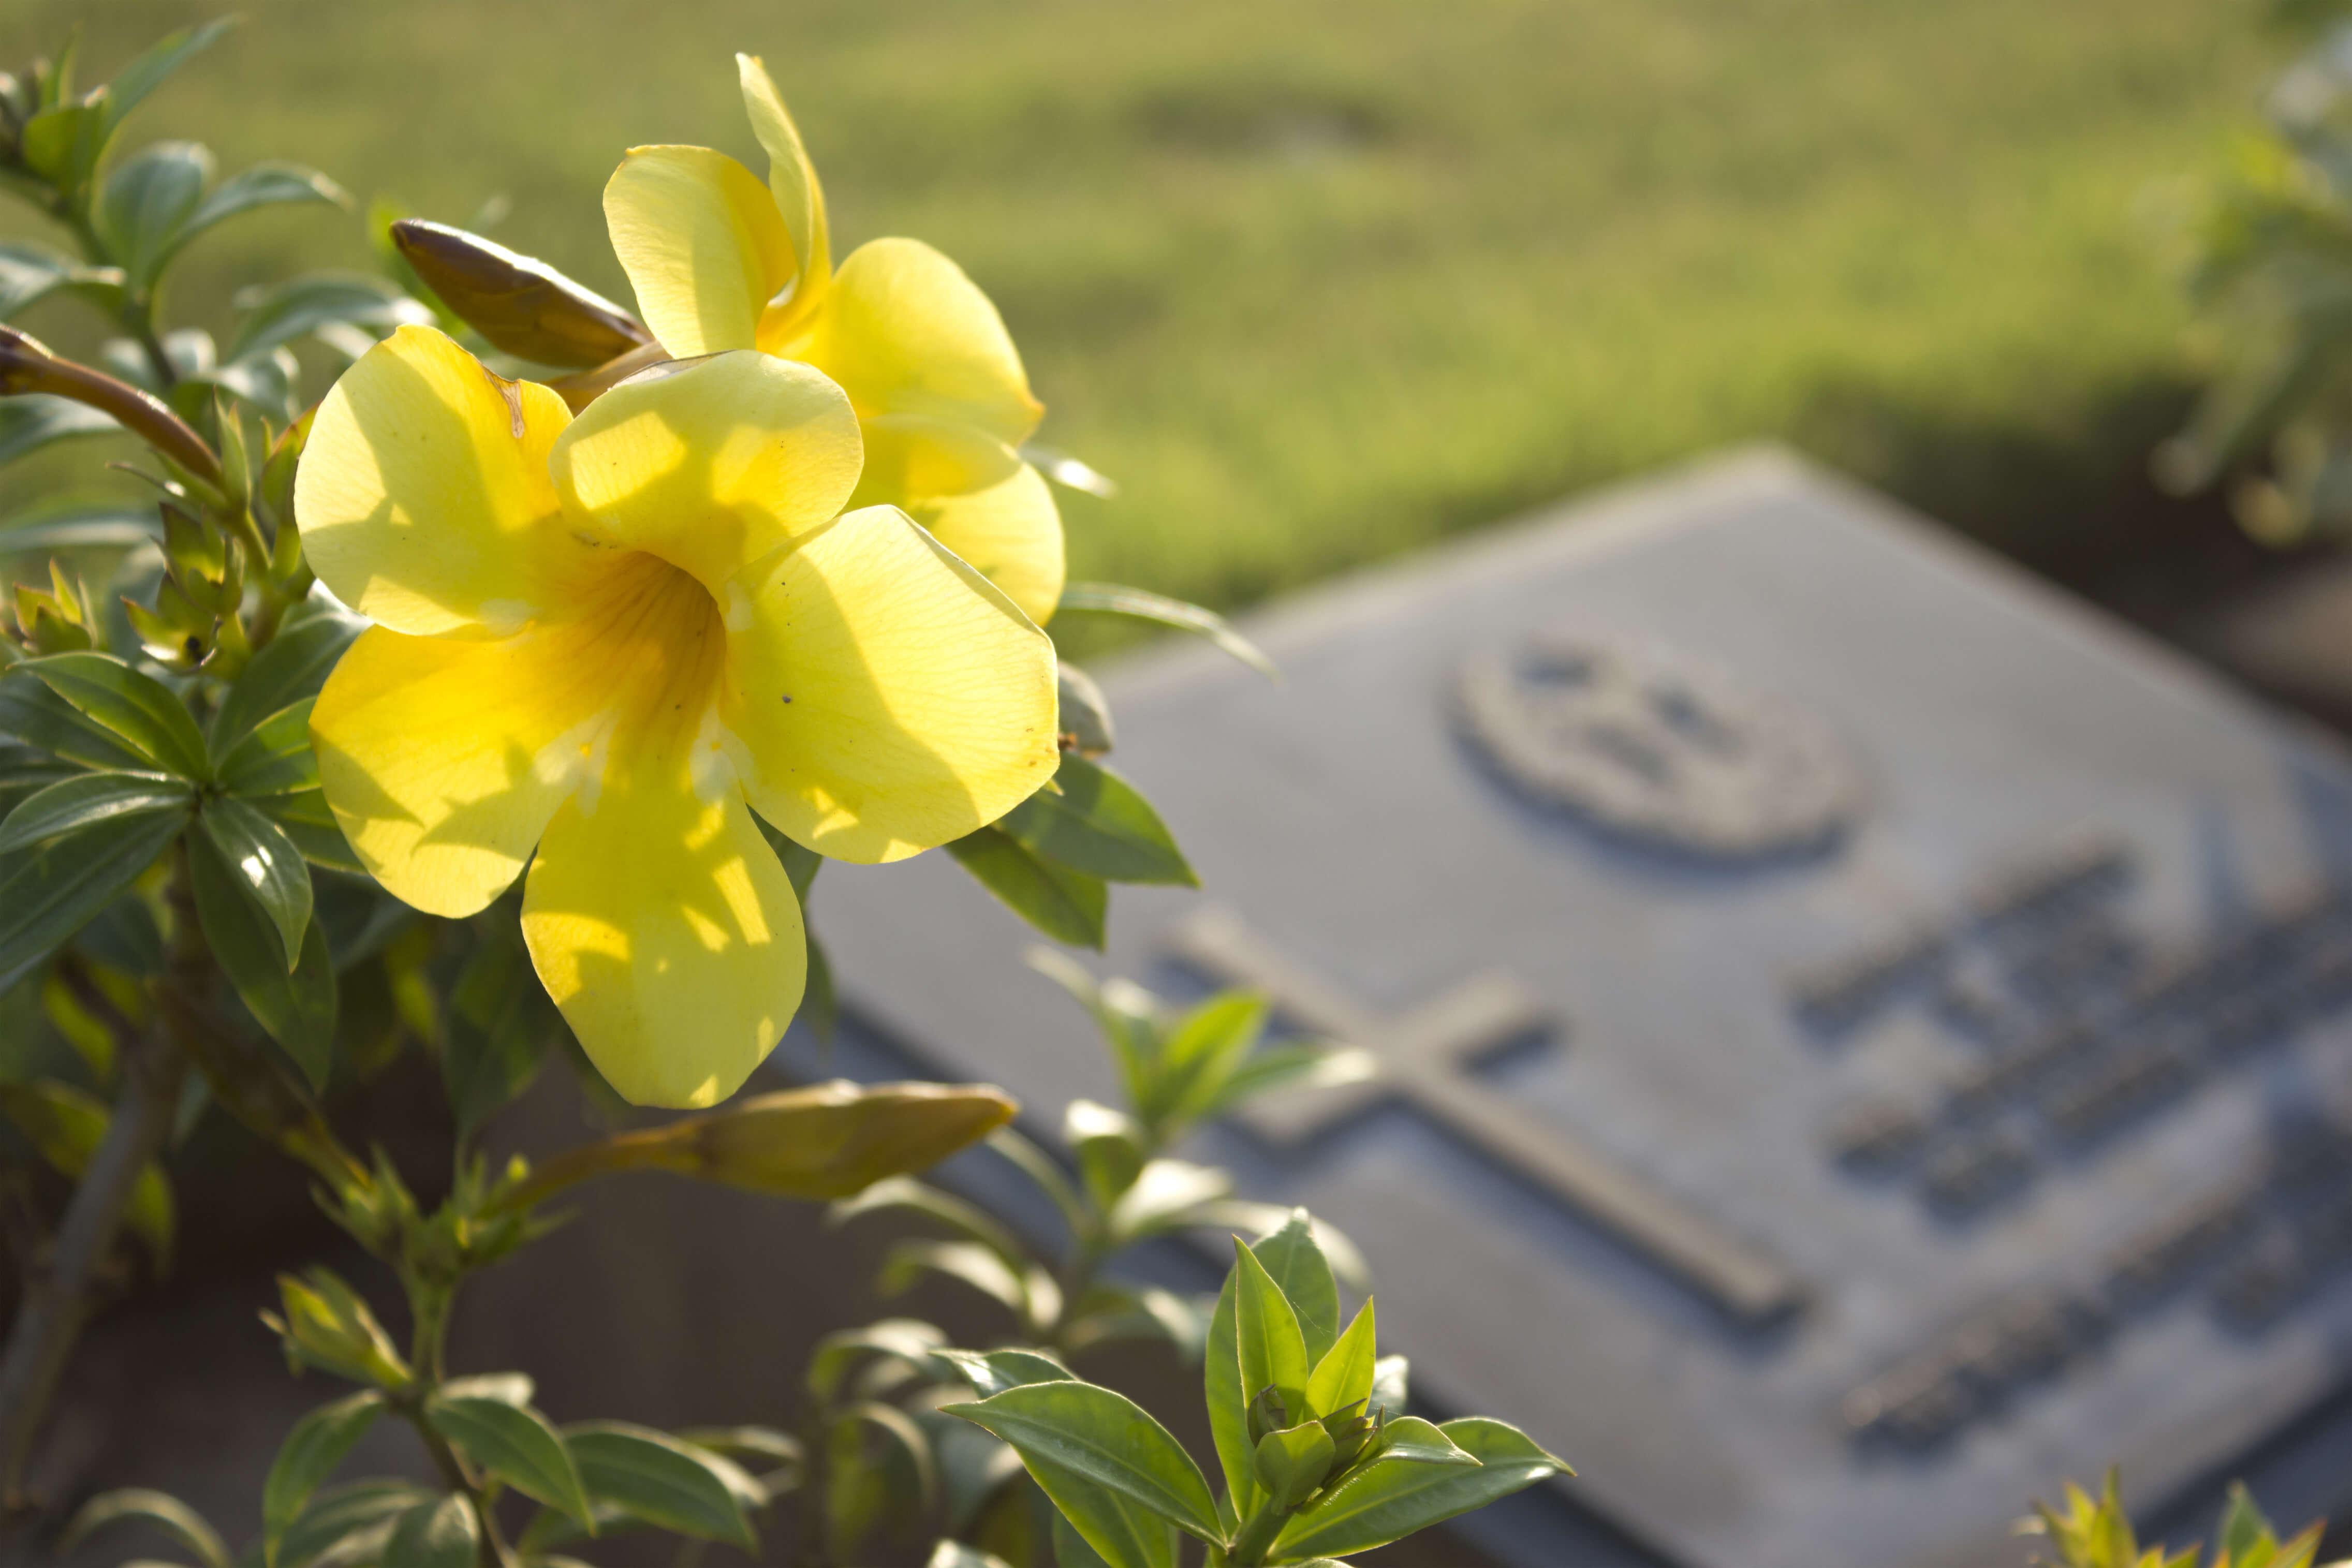 como surgiram os cemitérios